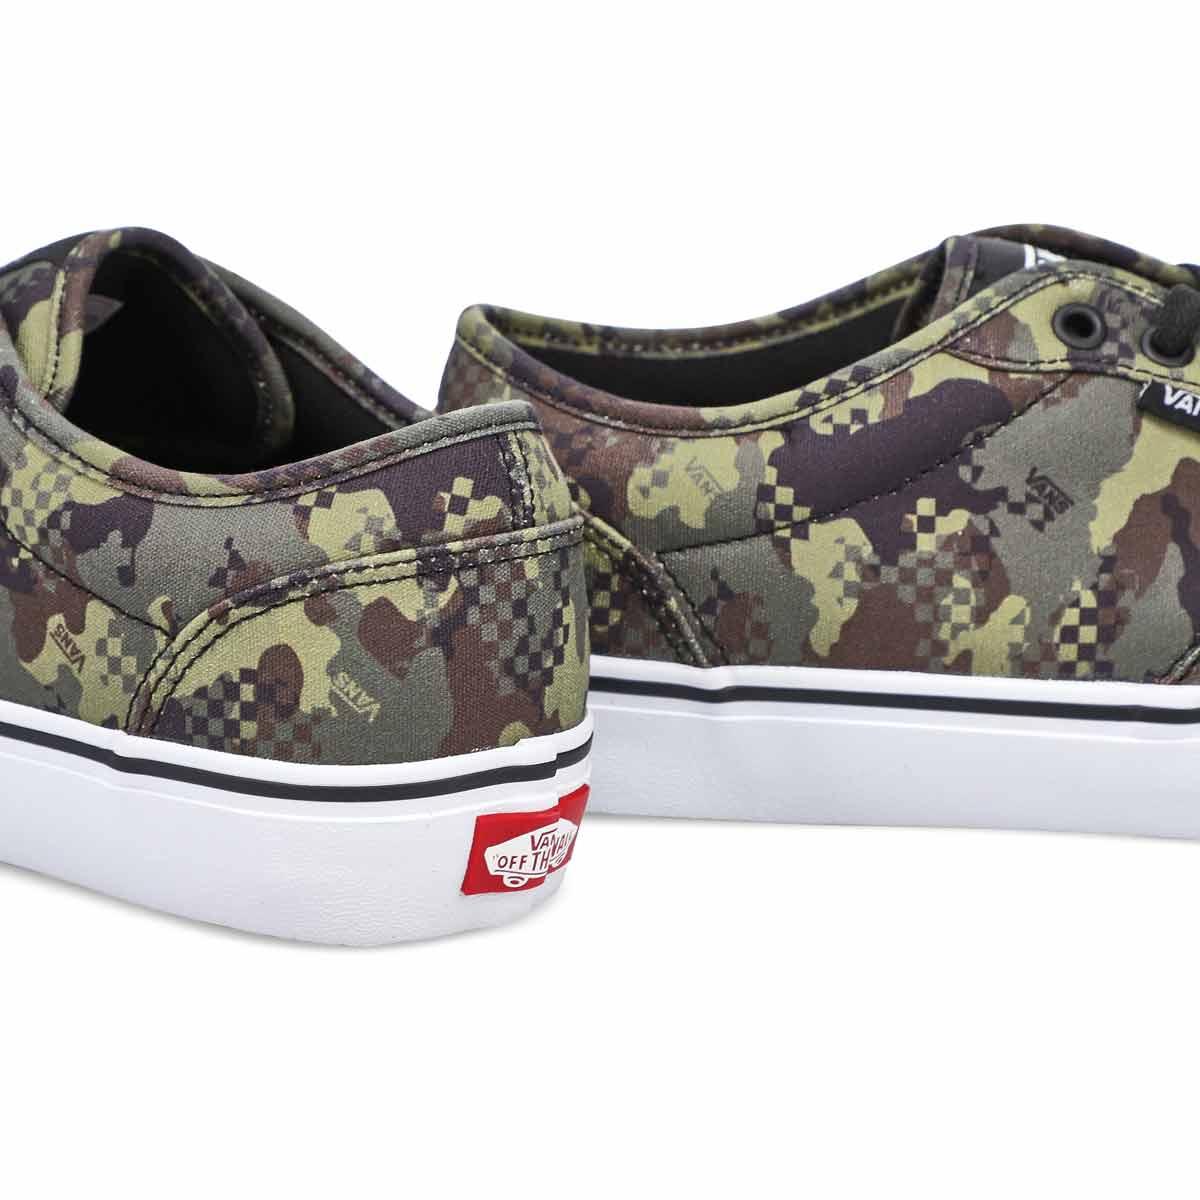 Men's Atwood Sneaker - Camo/Black/White